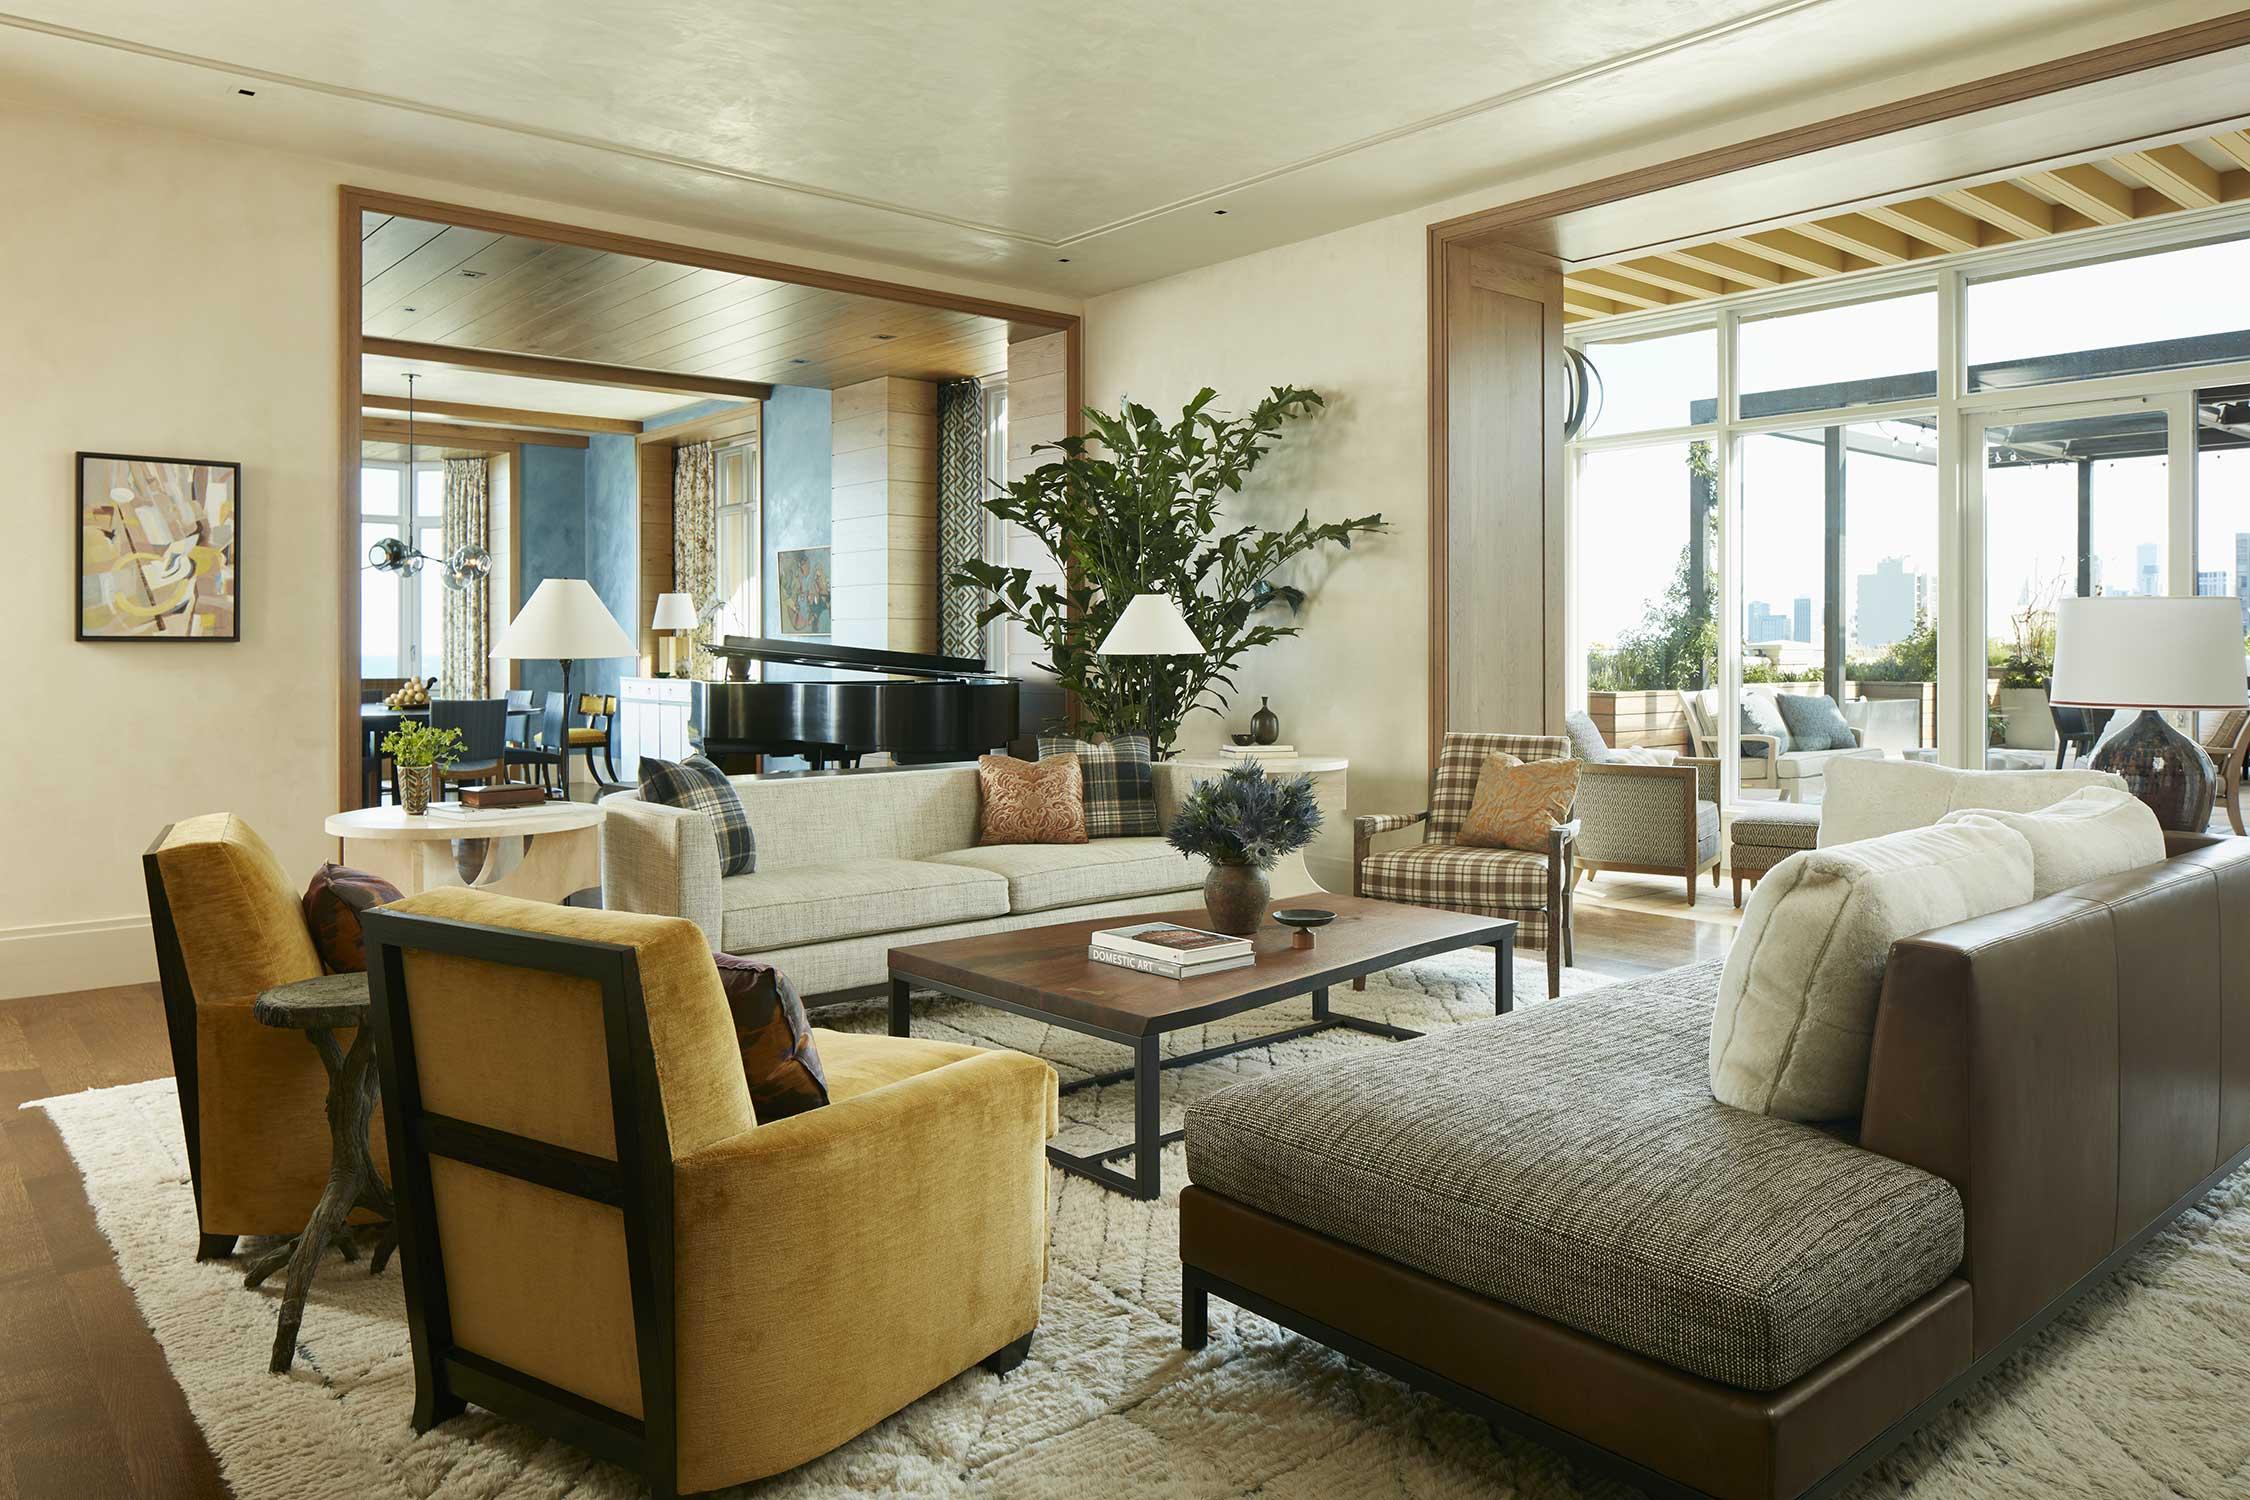 window treatments & throw pillows  Interior Design: Bruce Fox, Inc.